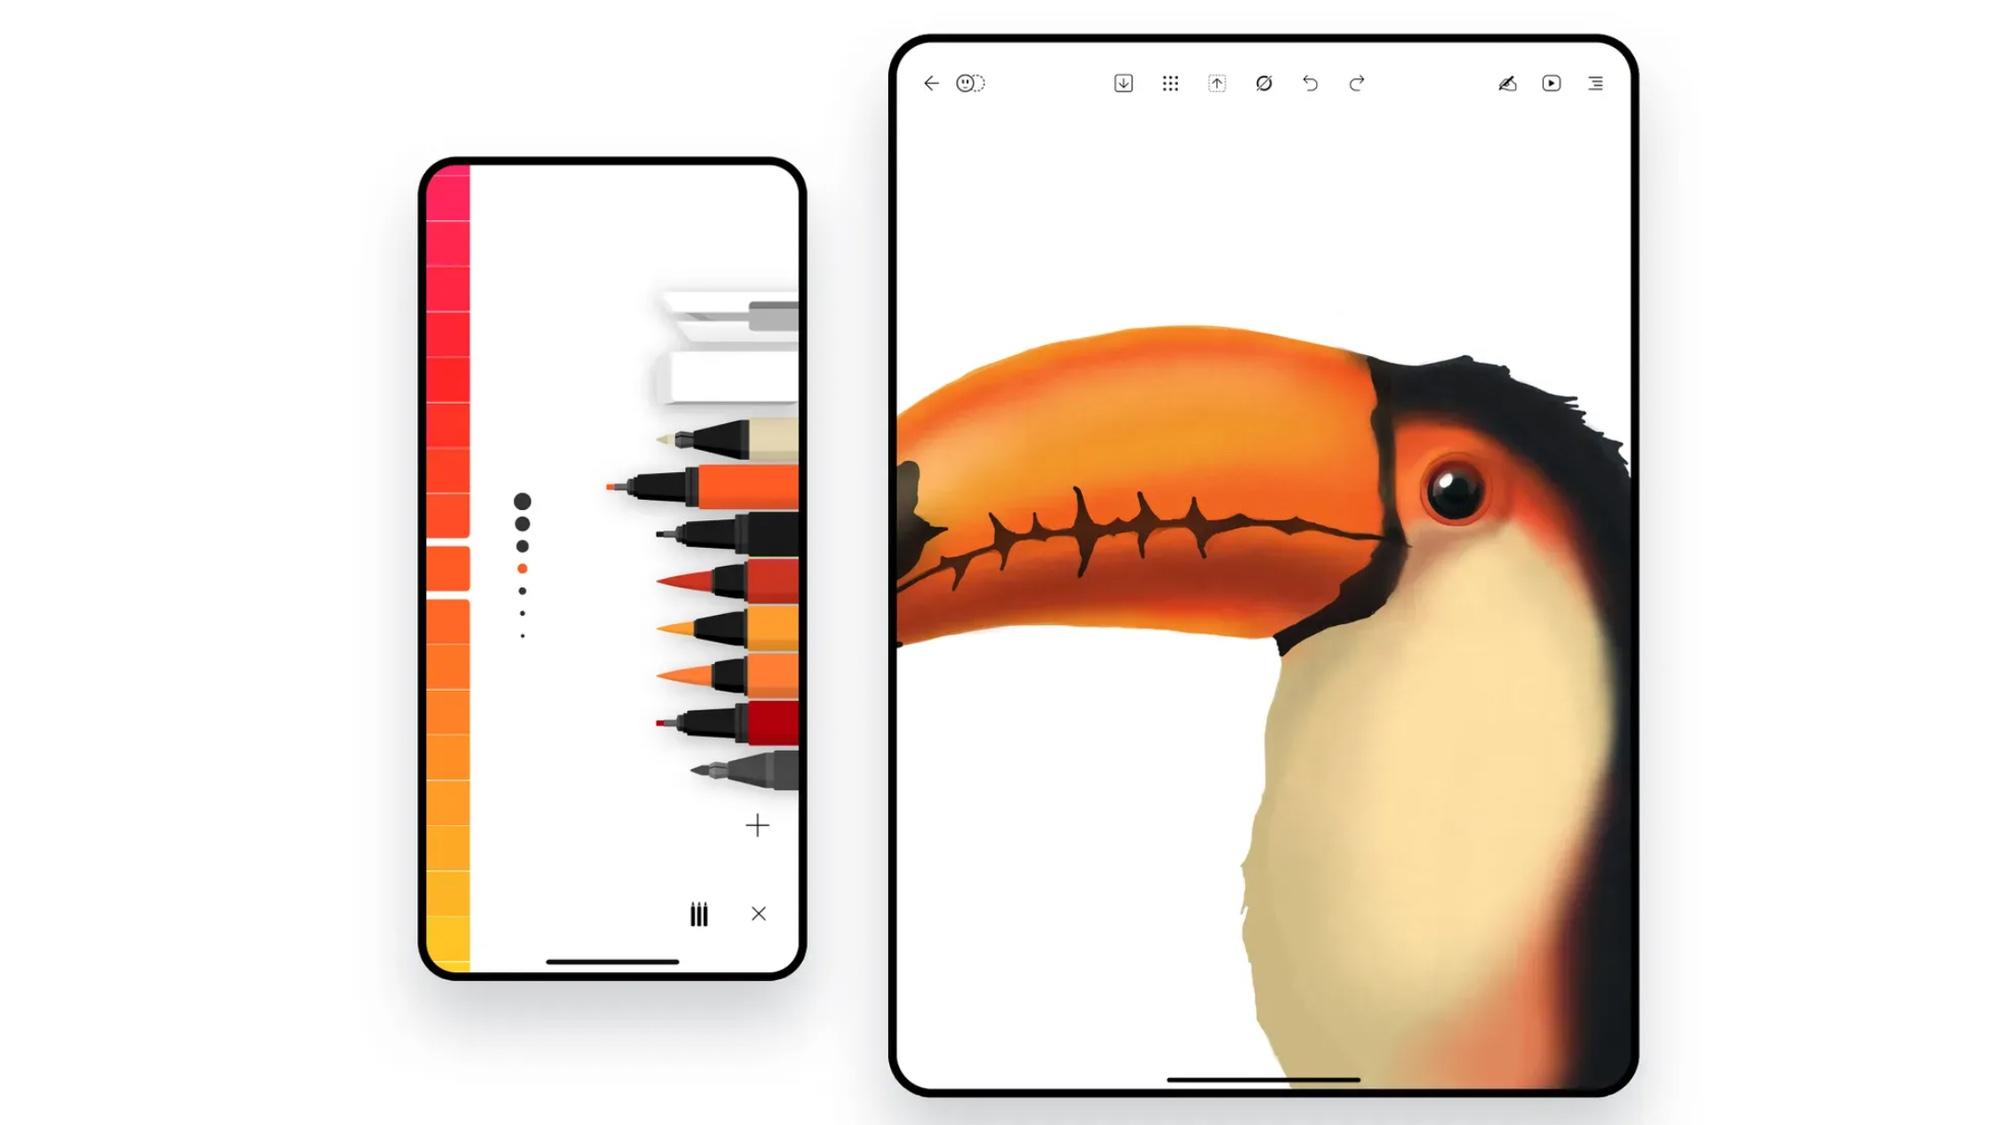 best iphone apps: Flow by Moleskine